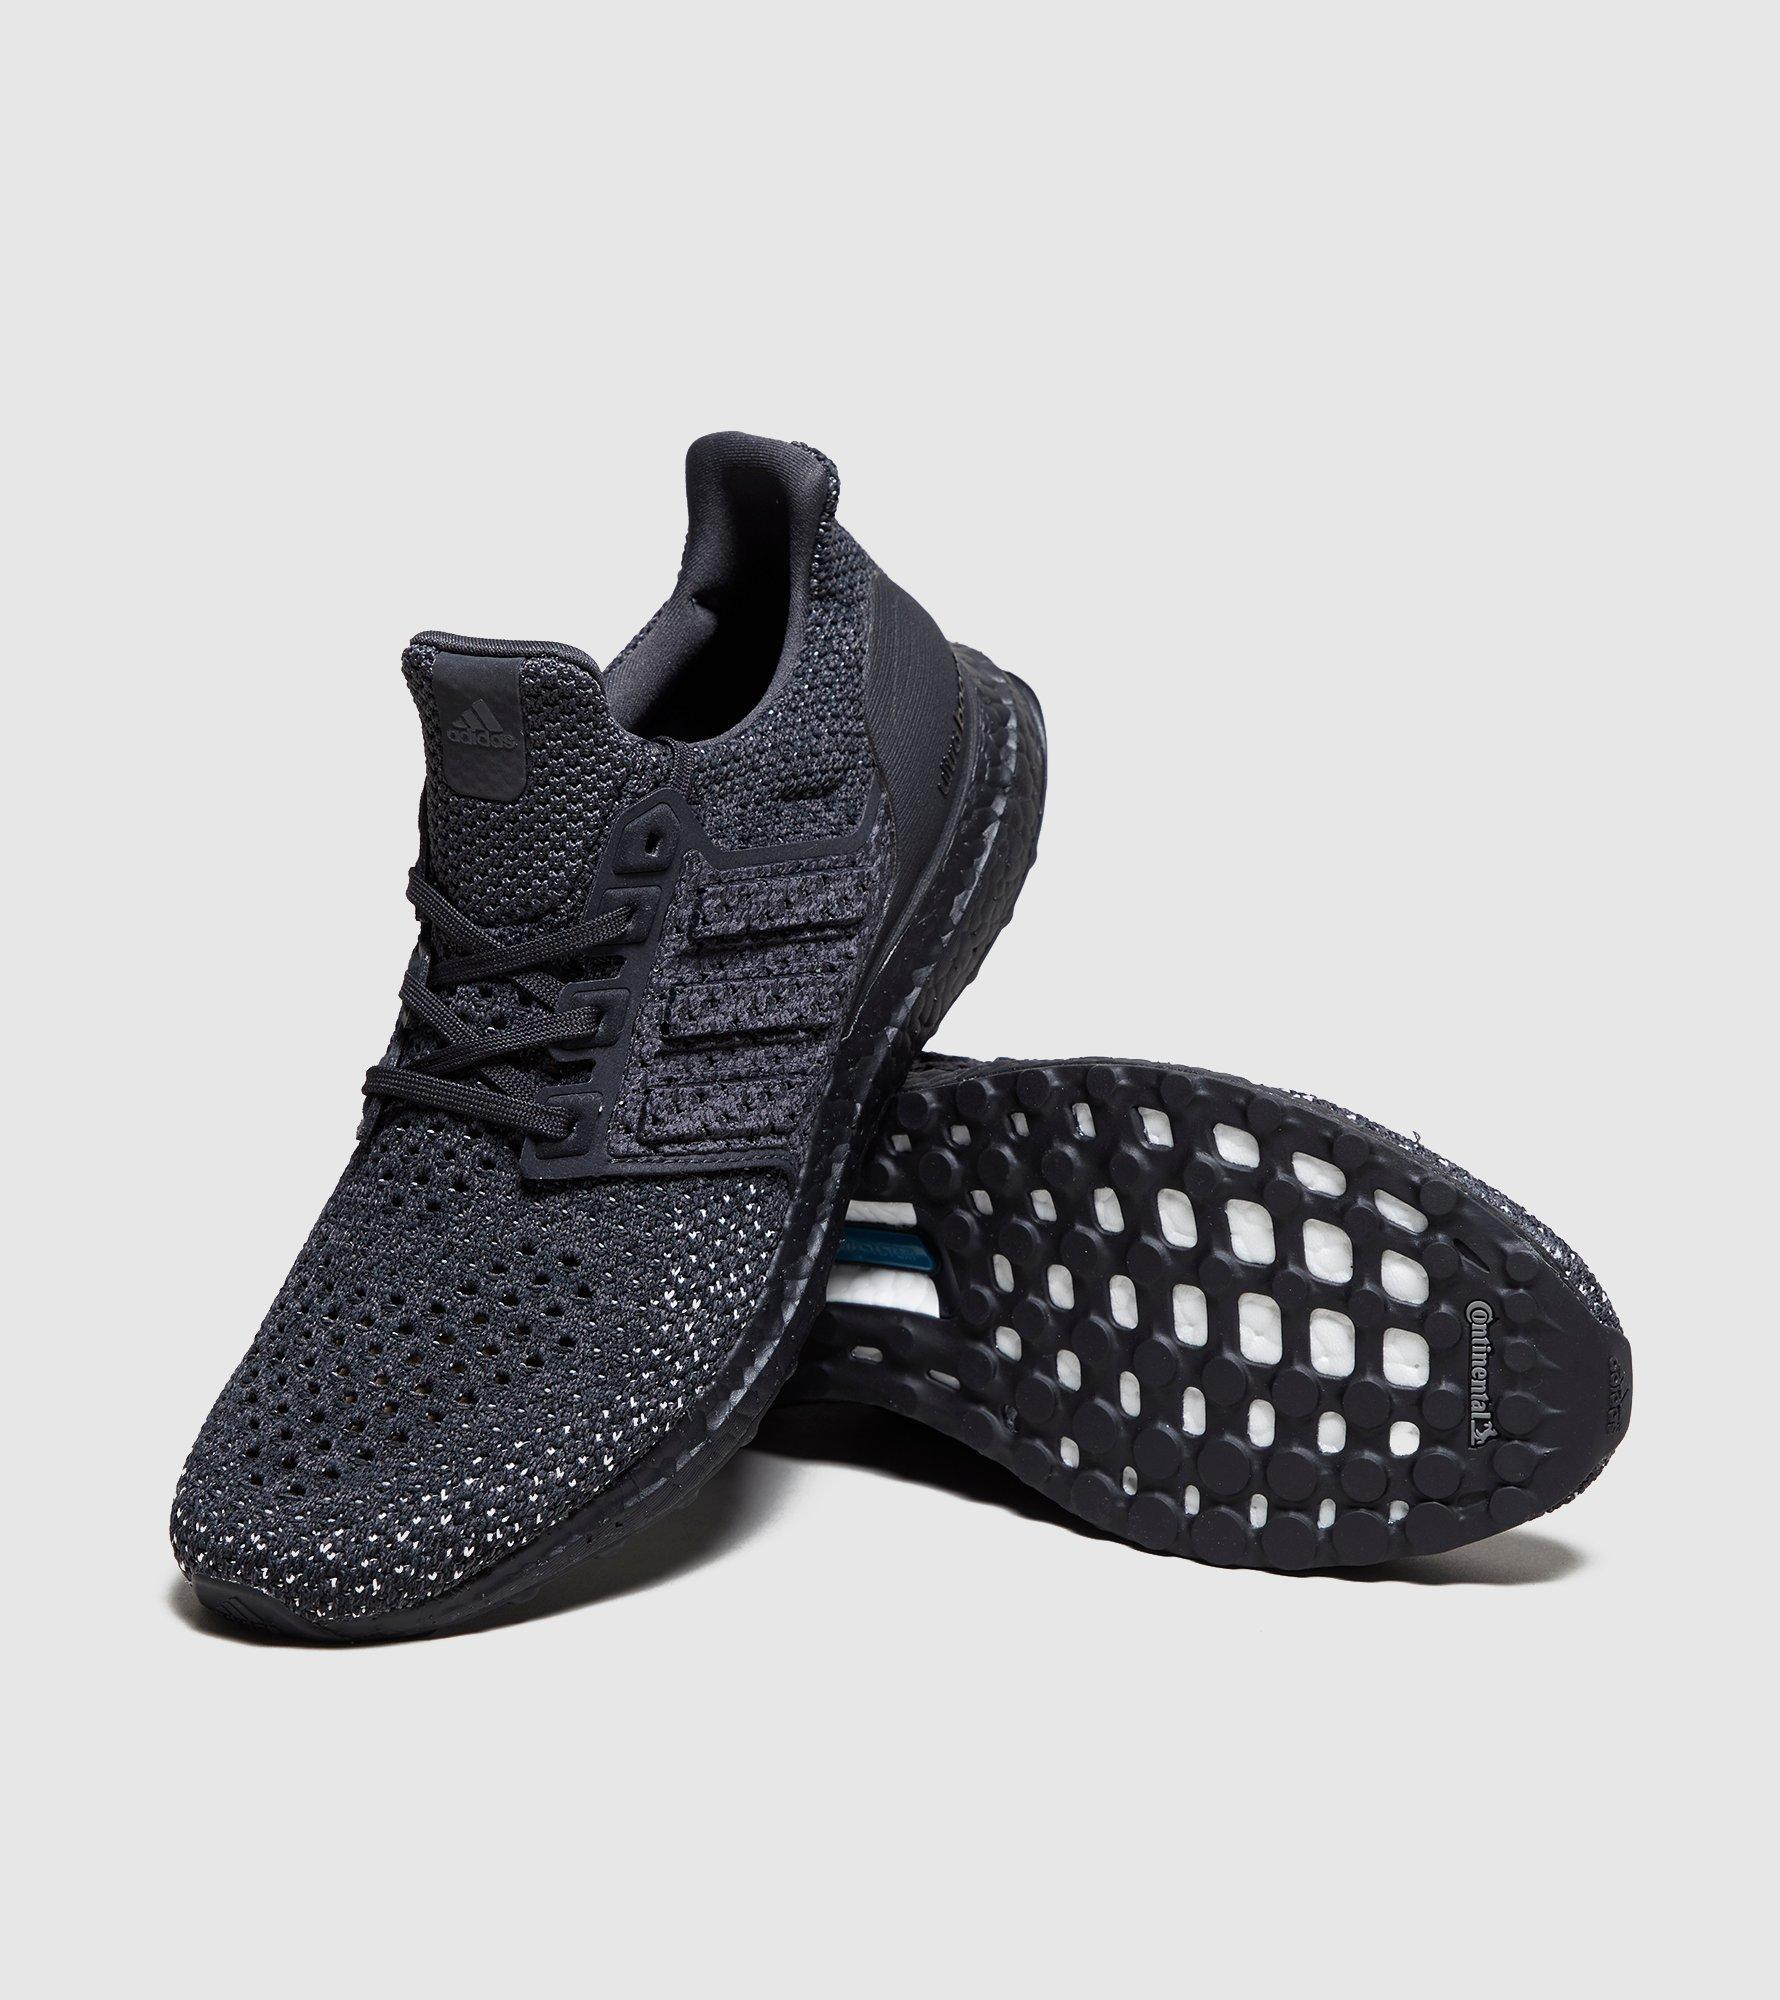 a594d95f739ca ... australia adidas ultra boost clima in black for men lyst 85359 66921